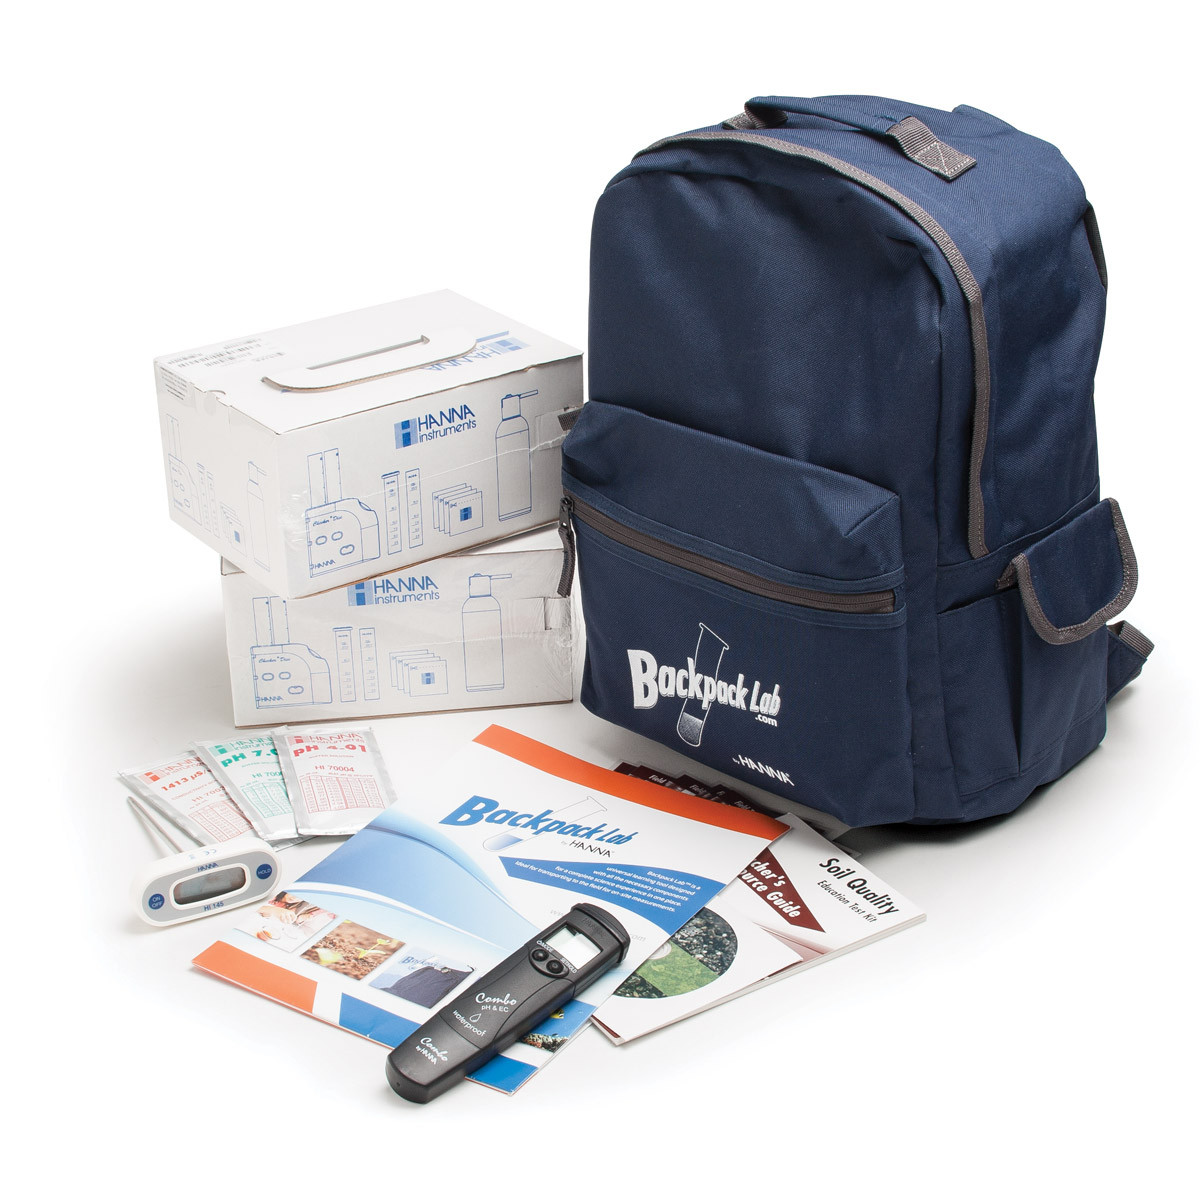 Backpack Lab Soil Quality Educational Test Kit